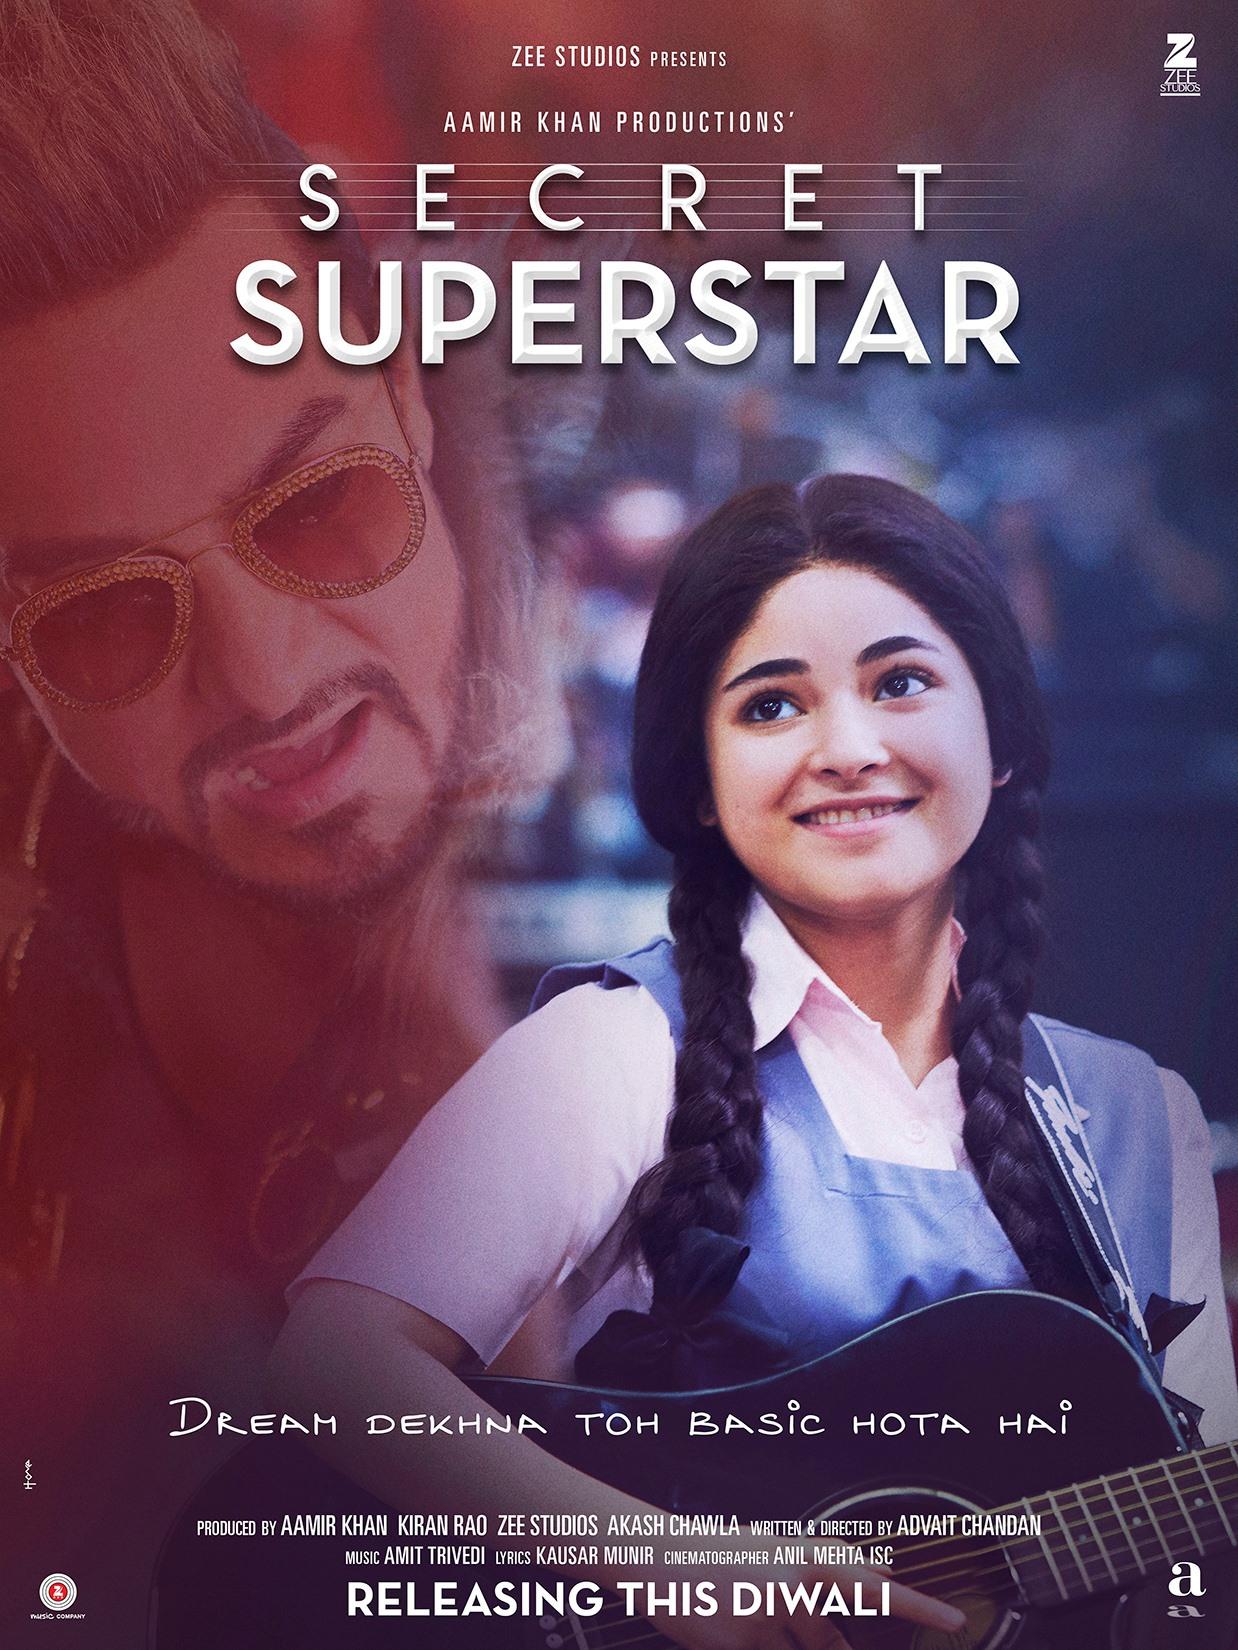 Secret Superstar (2017) Amir Khan New Full HD Hindi Movie